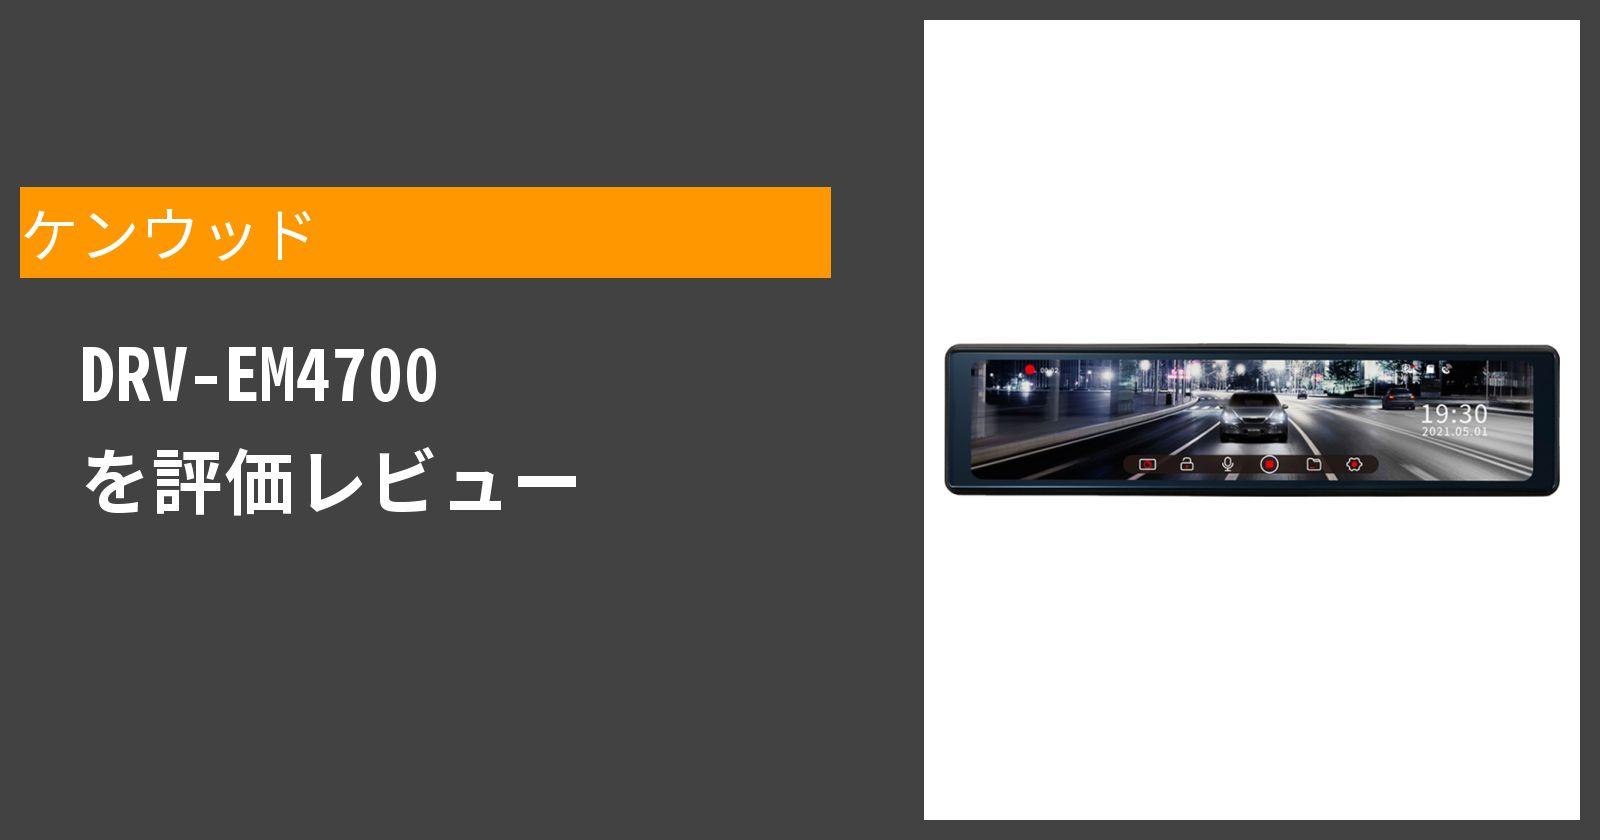 DRV-EM4700を徹底評価